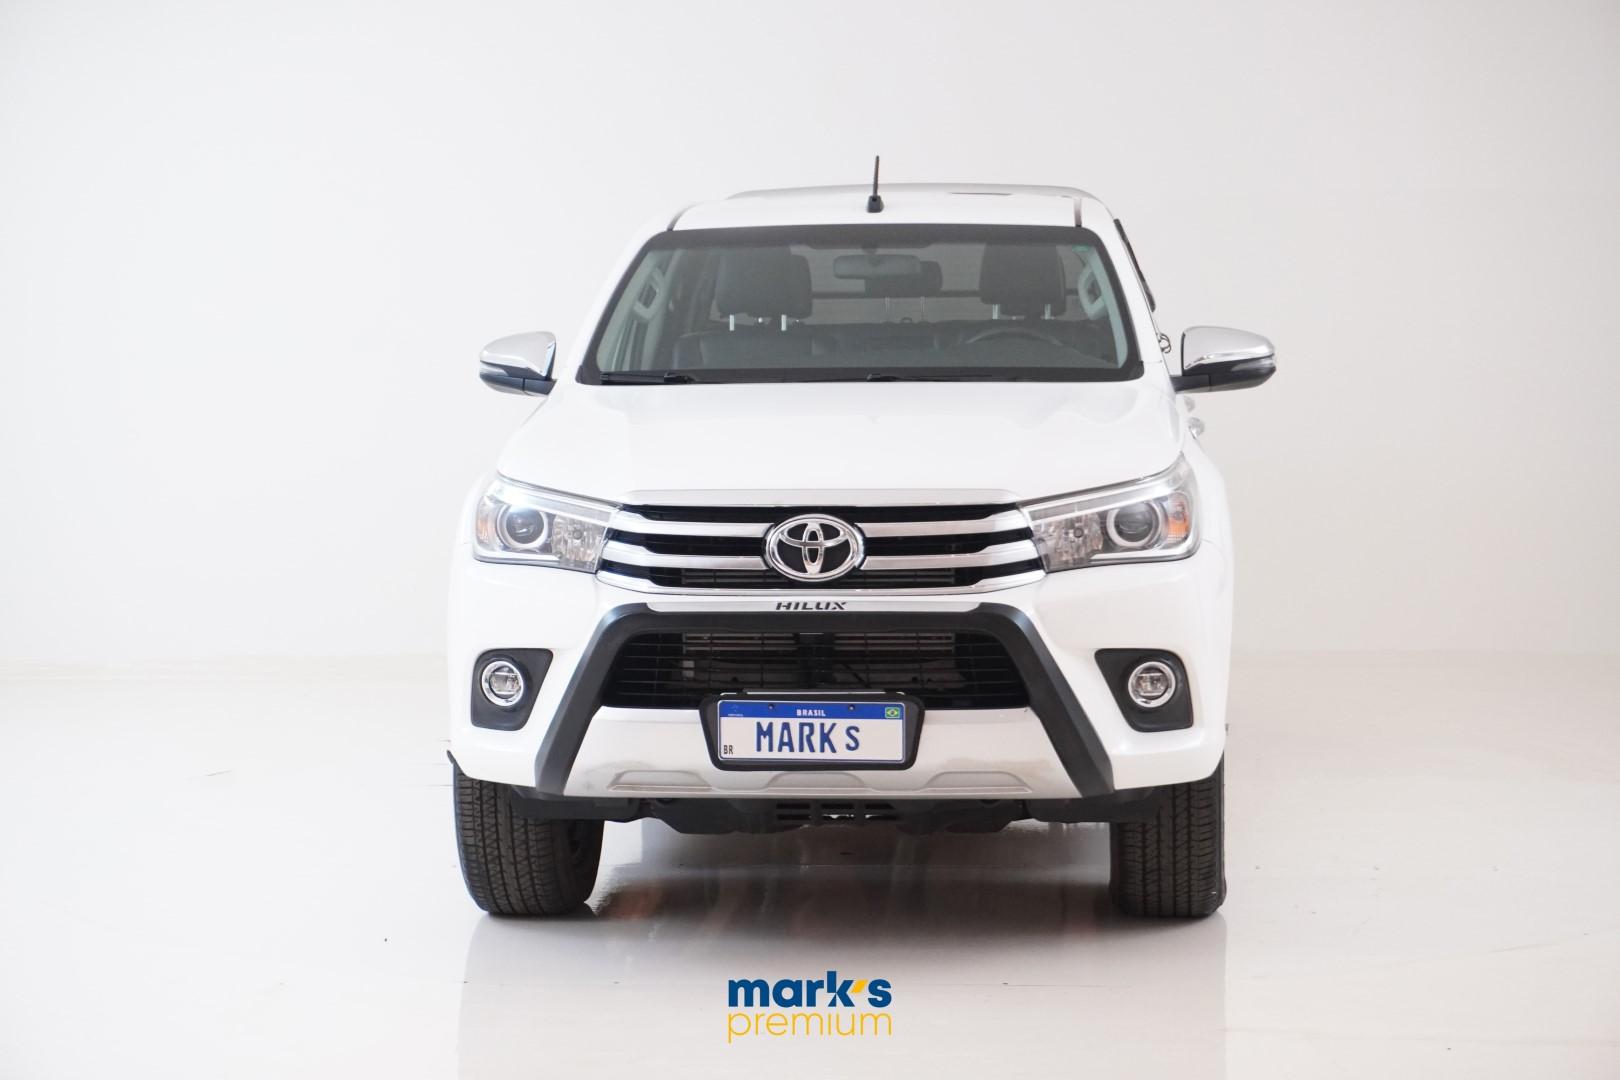 Foto do veículo Toyota Hilux Cabine Dupla